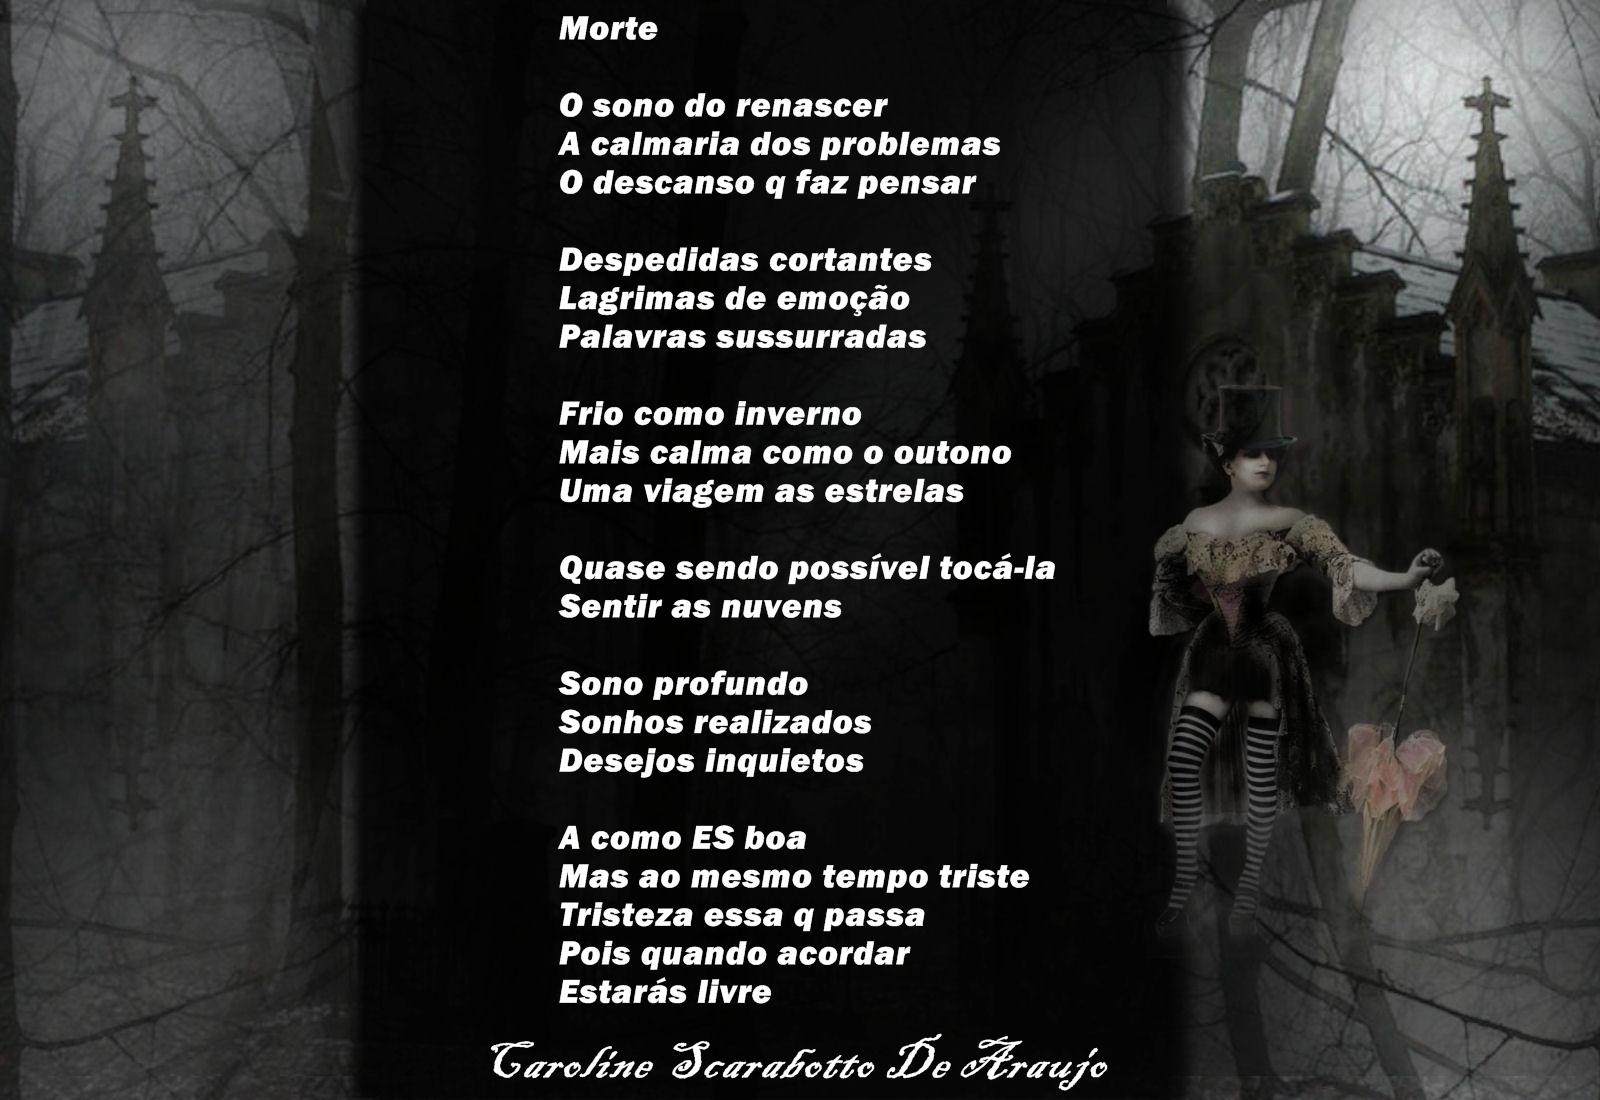 Suficiente Carol Poemas e Poesias: Carol Poemas e Poesias -Morte DF97